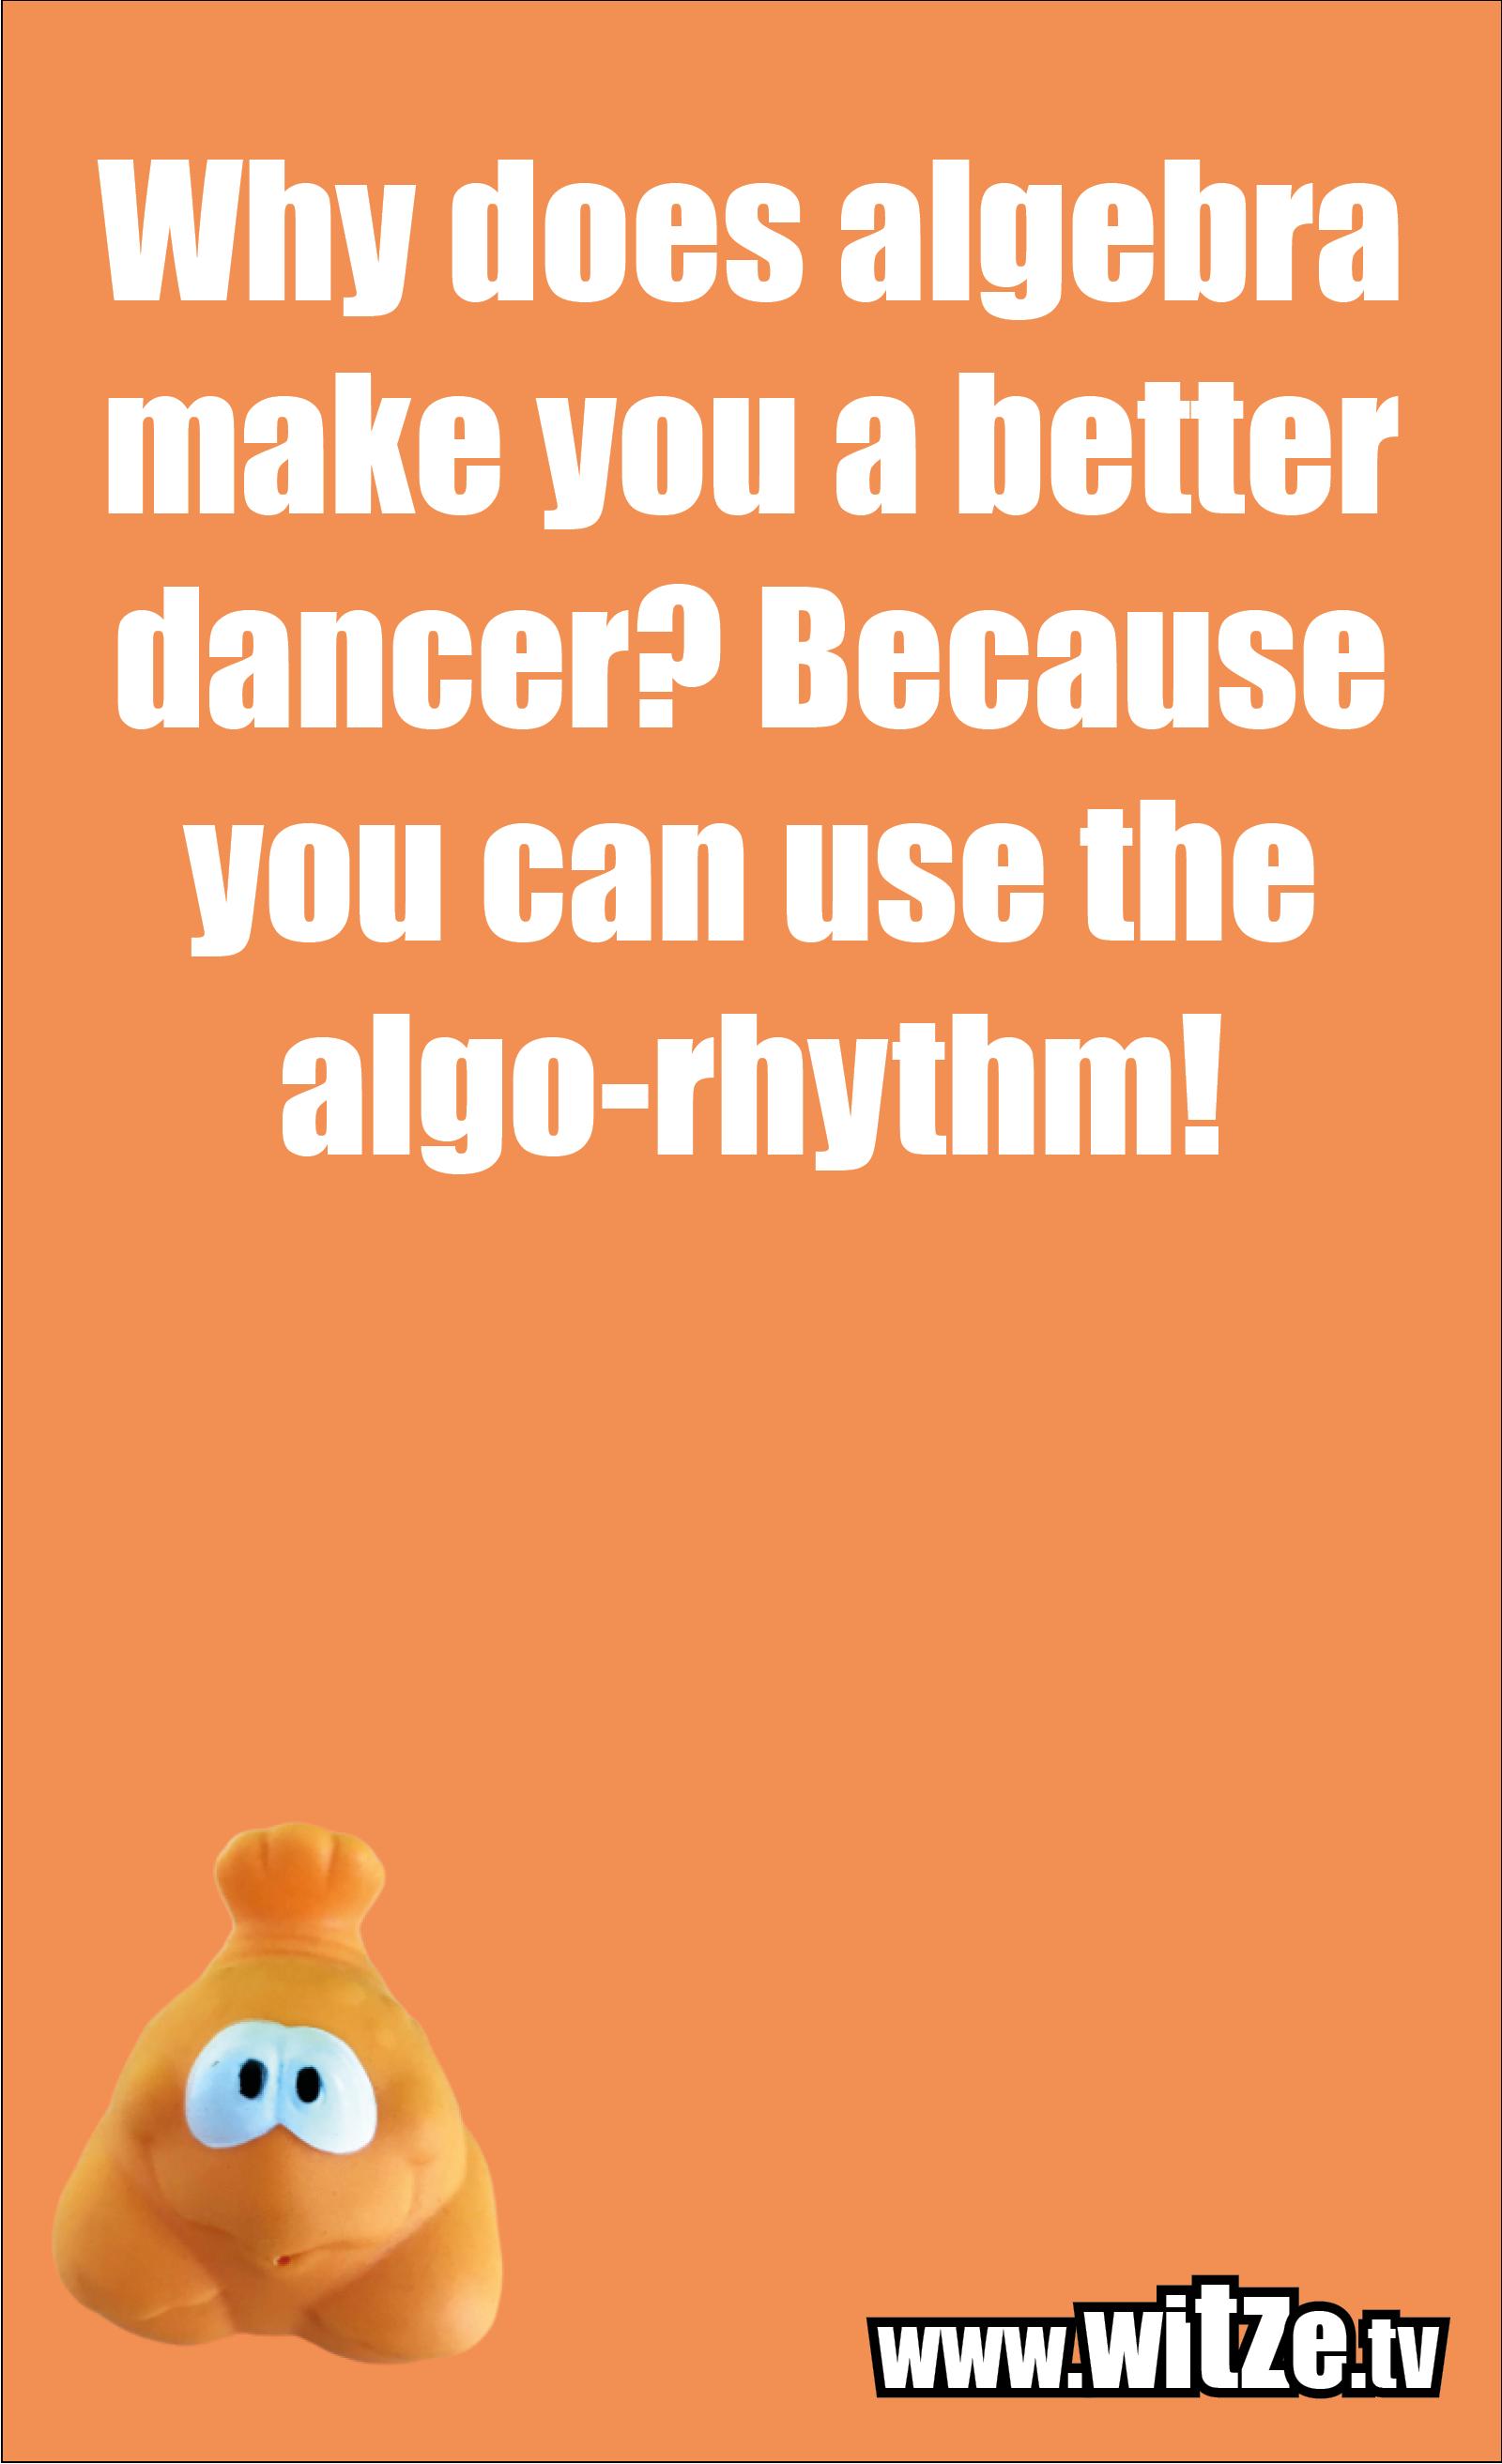 Math joke… Why does algebra make you a better dancer? Because you can use the algo-rhythm!